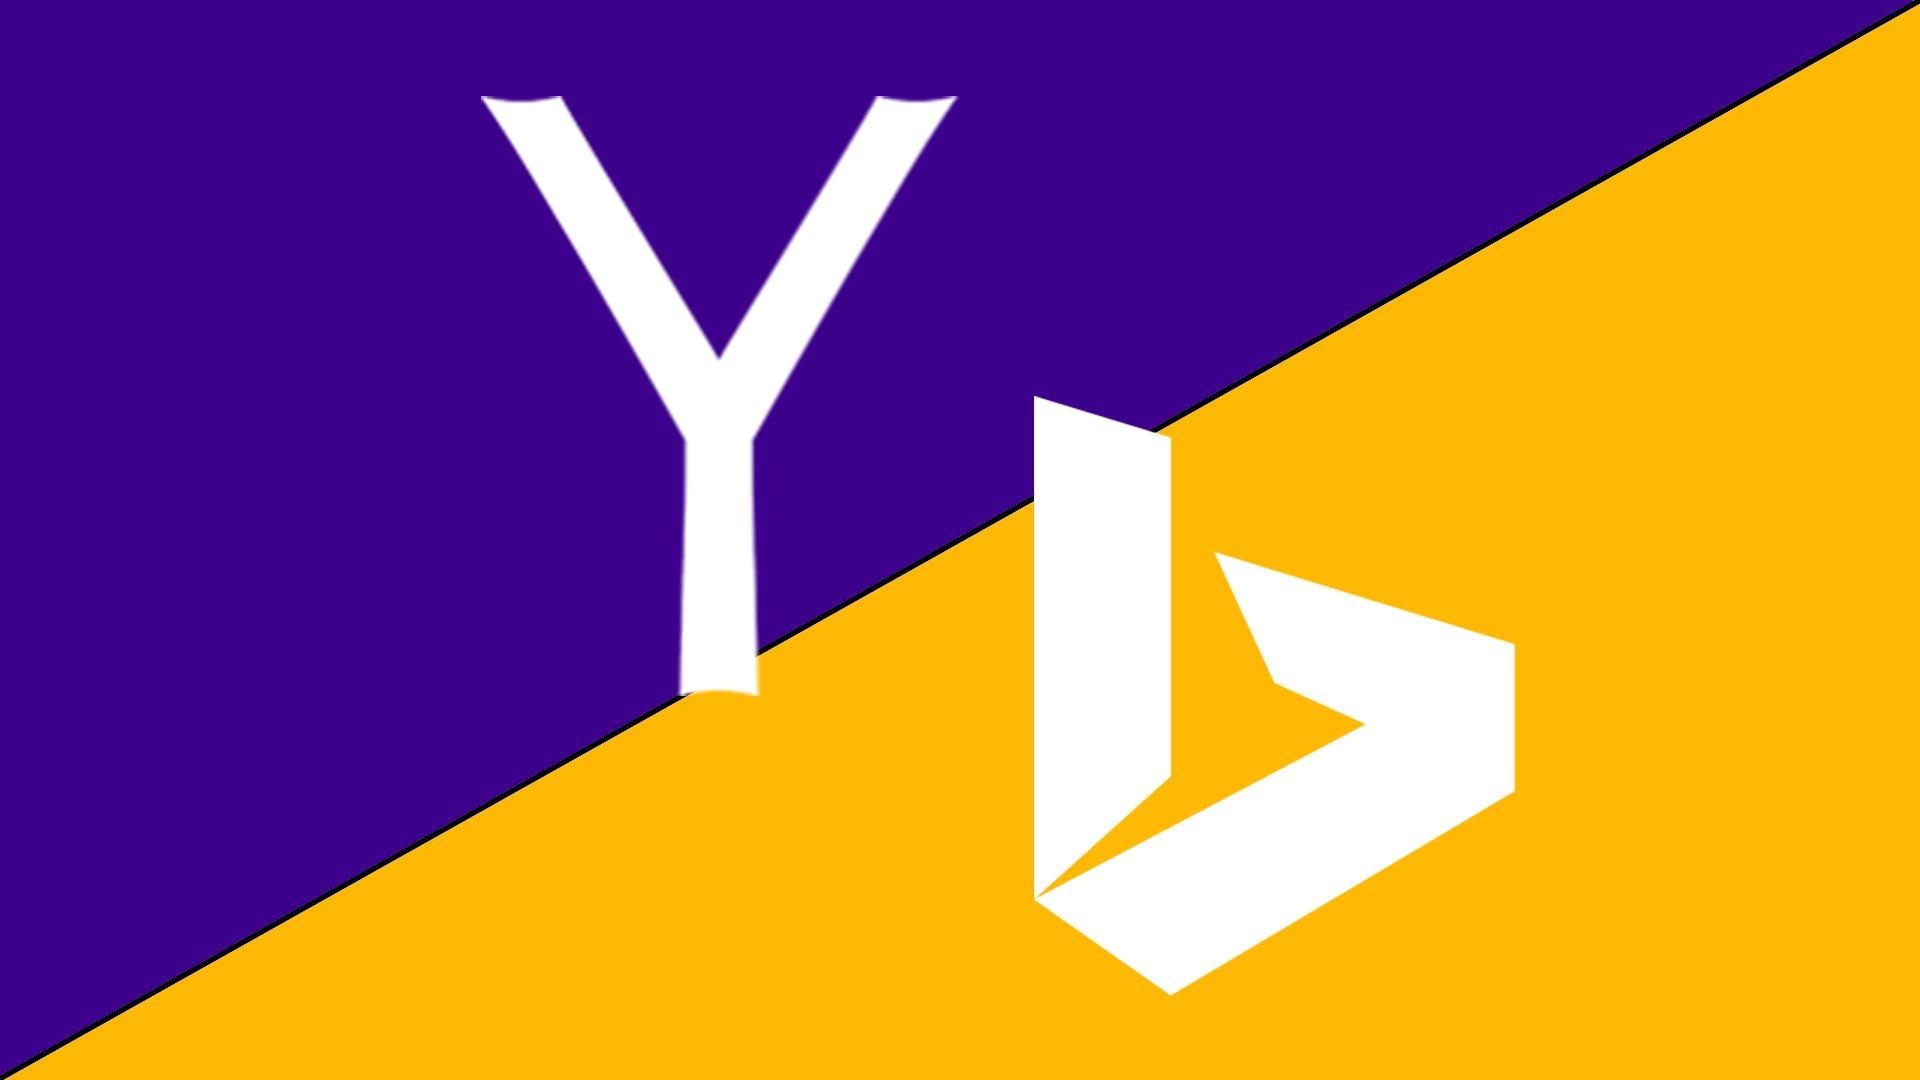 Yahoo Bing Contract